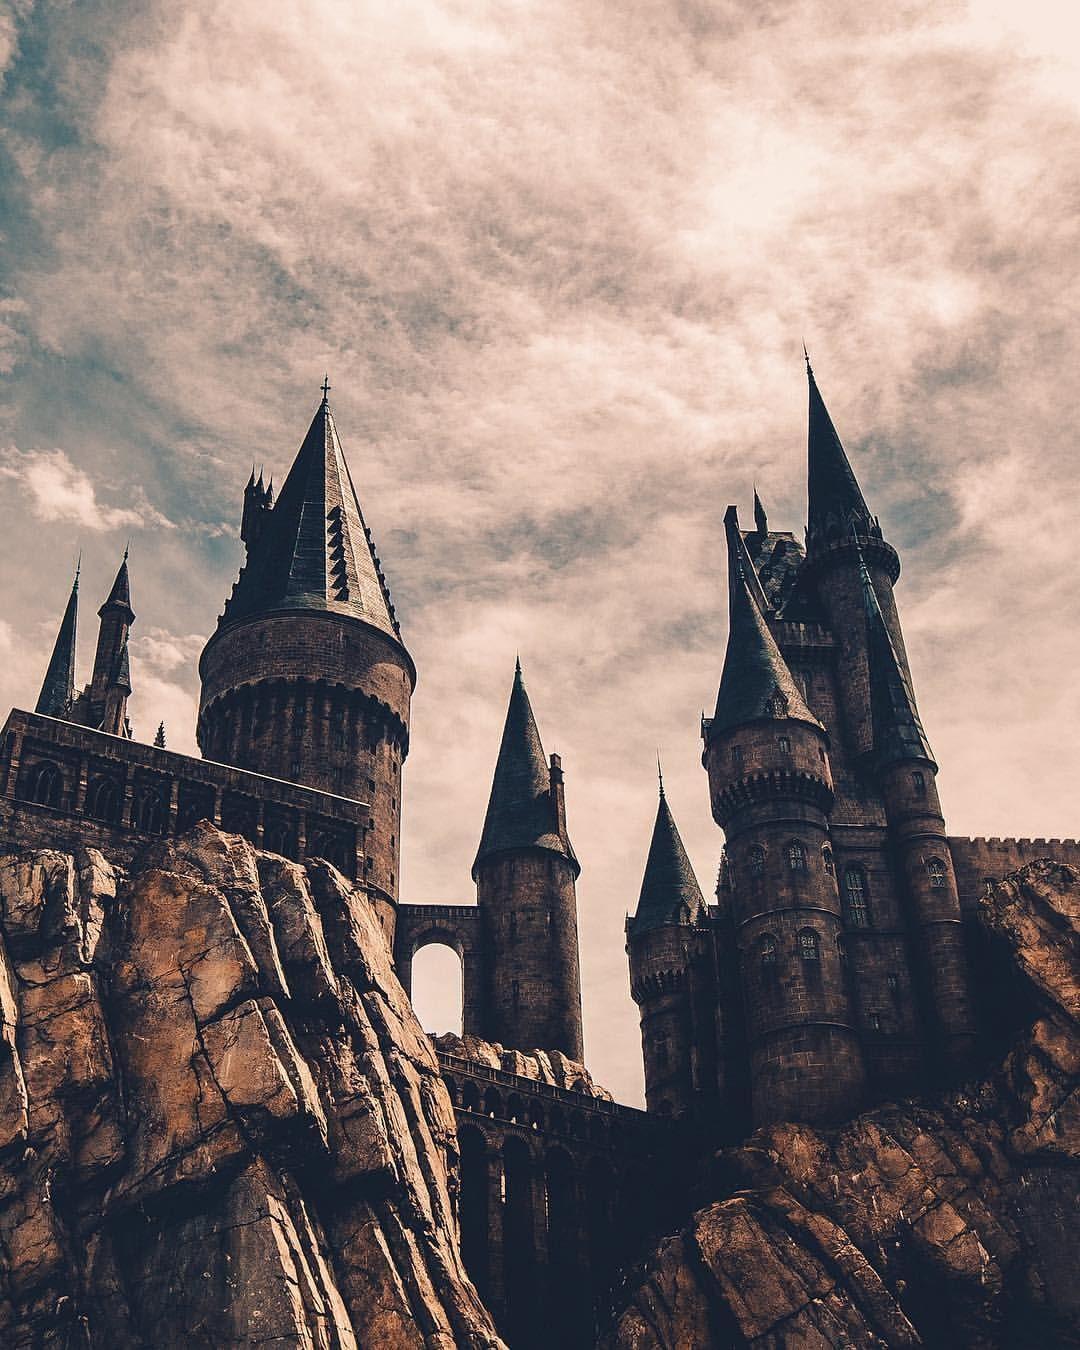 A Magic Castle Reaching To The Sky Magic Castle Hogwarts Aesthetic Harry Potter Castle